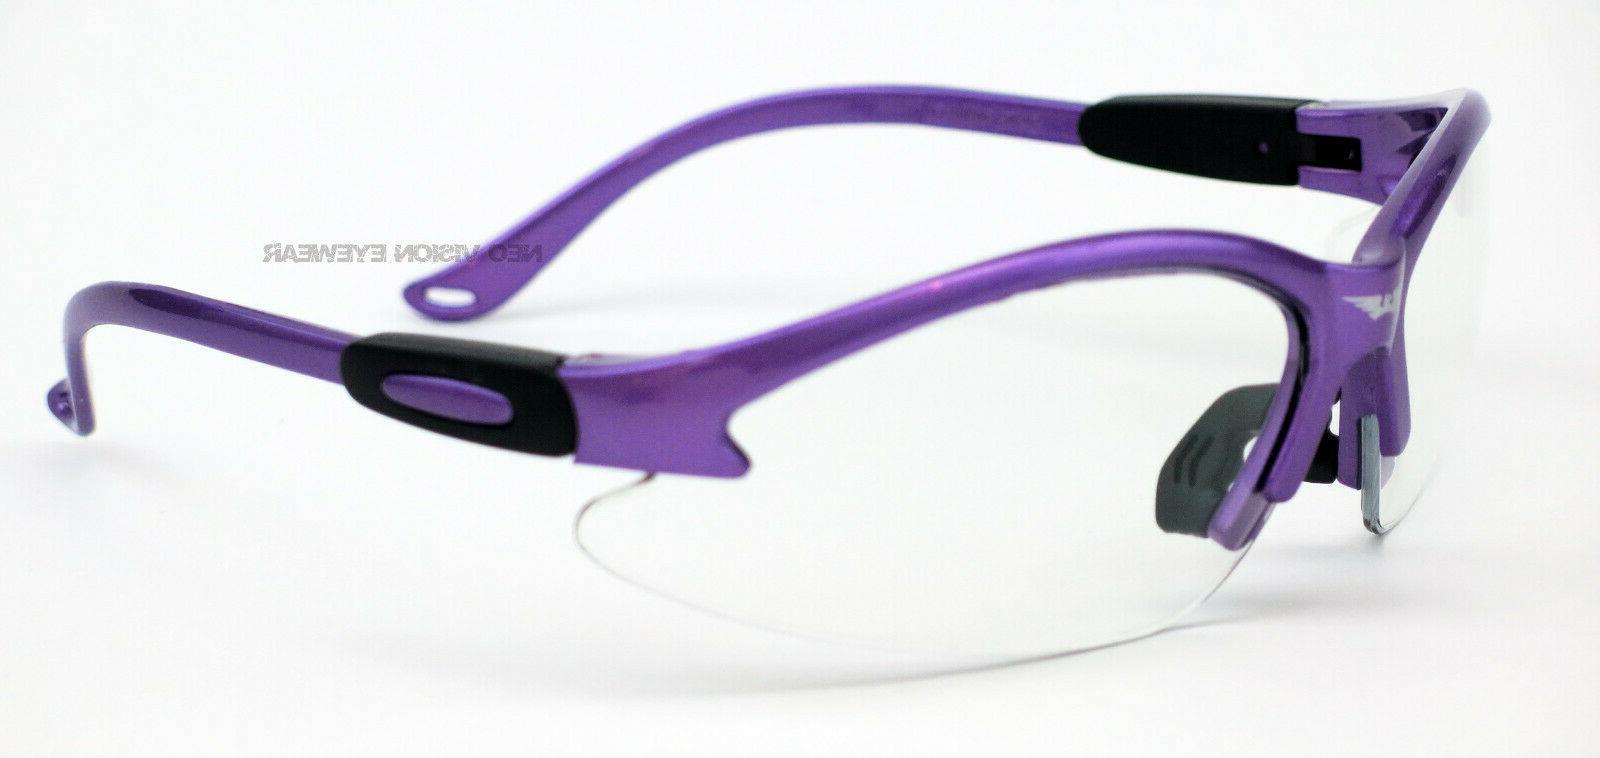 Global Vision Frame Clear Glasses Z87+